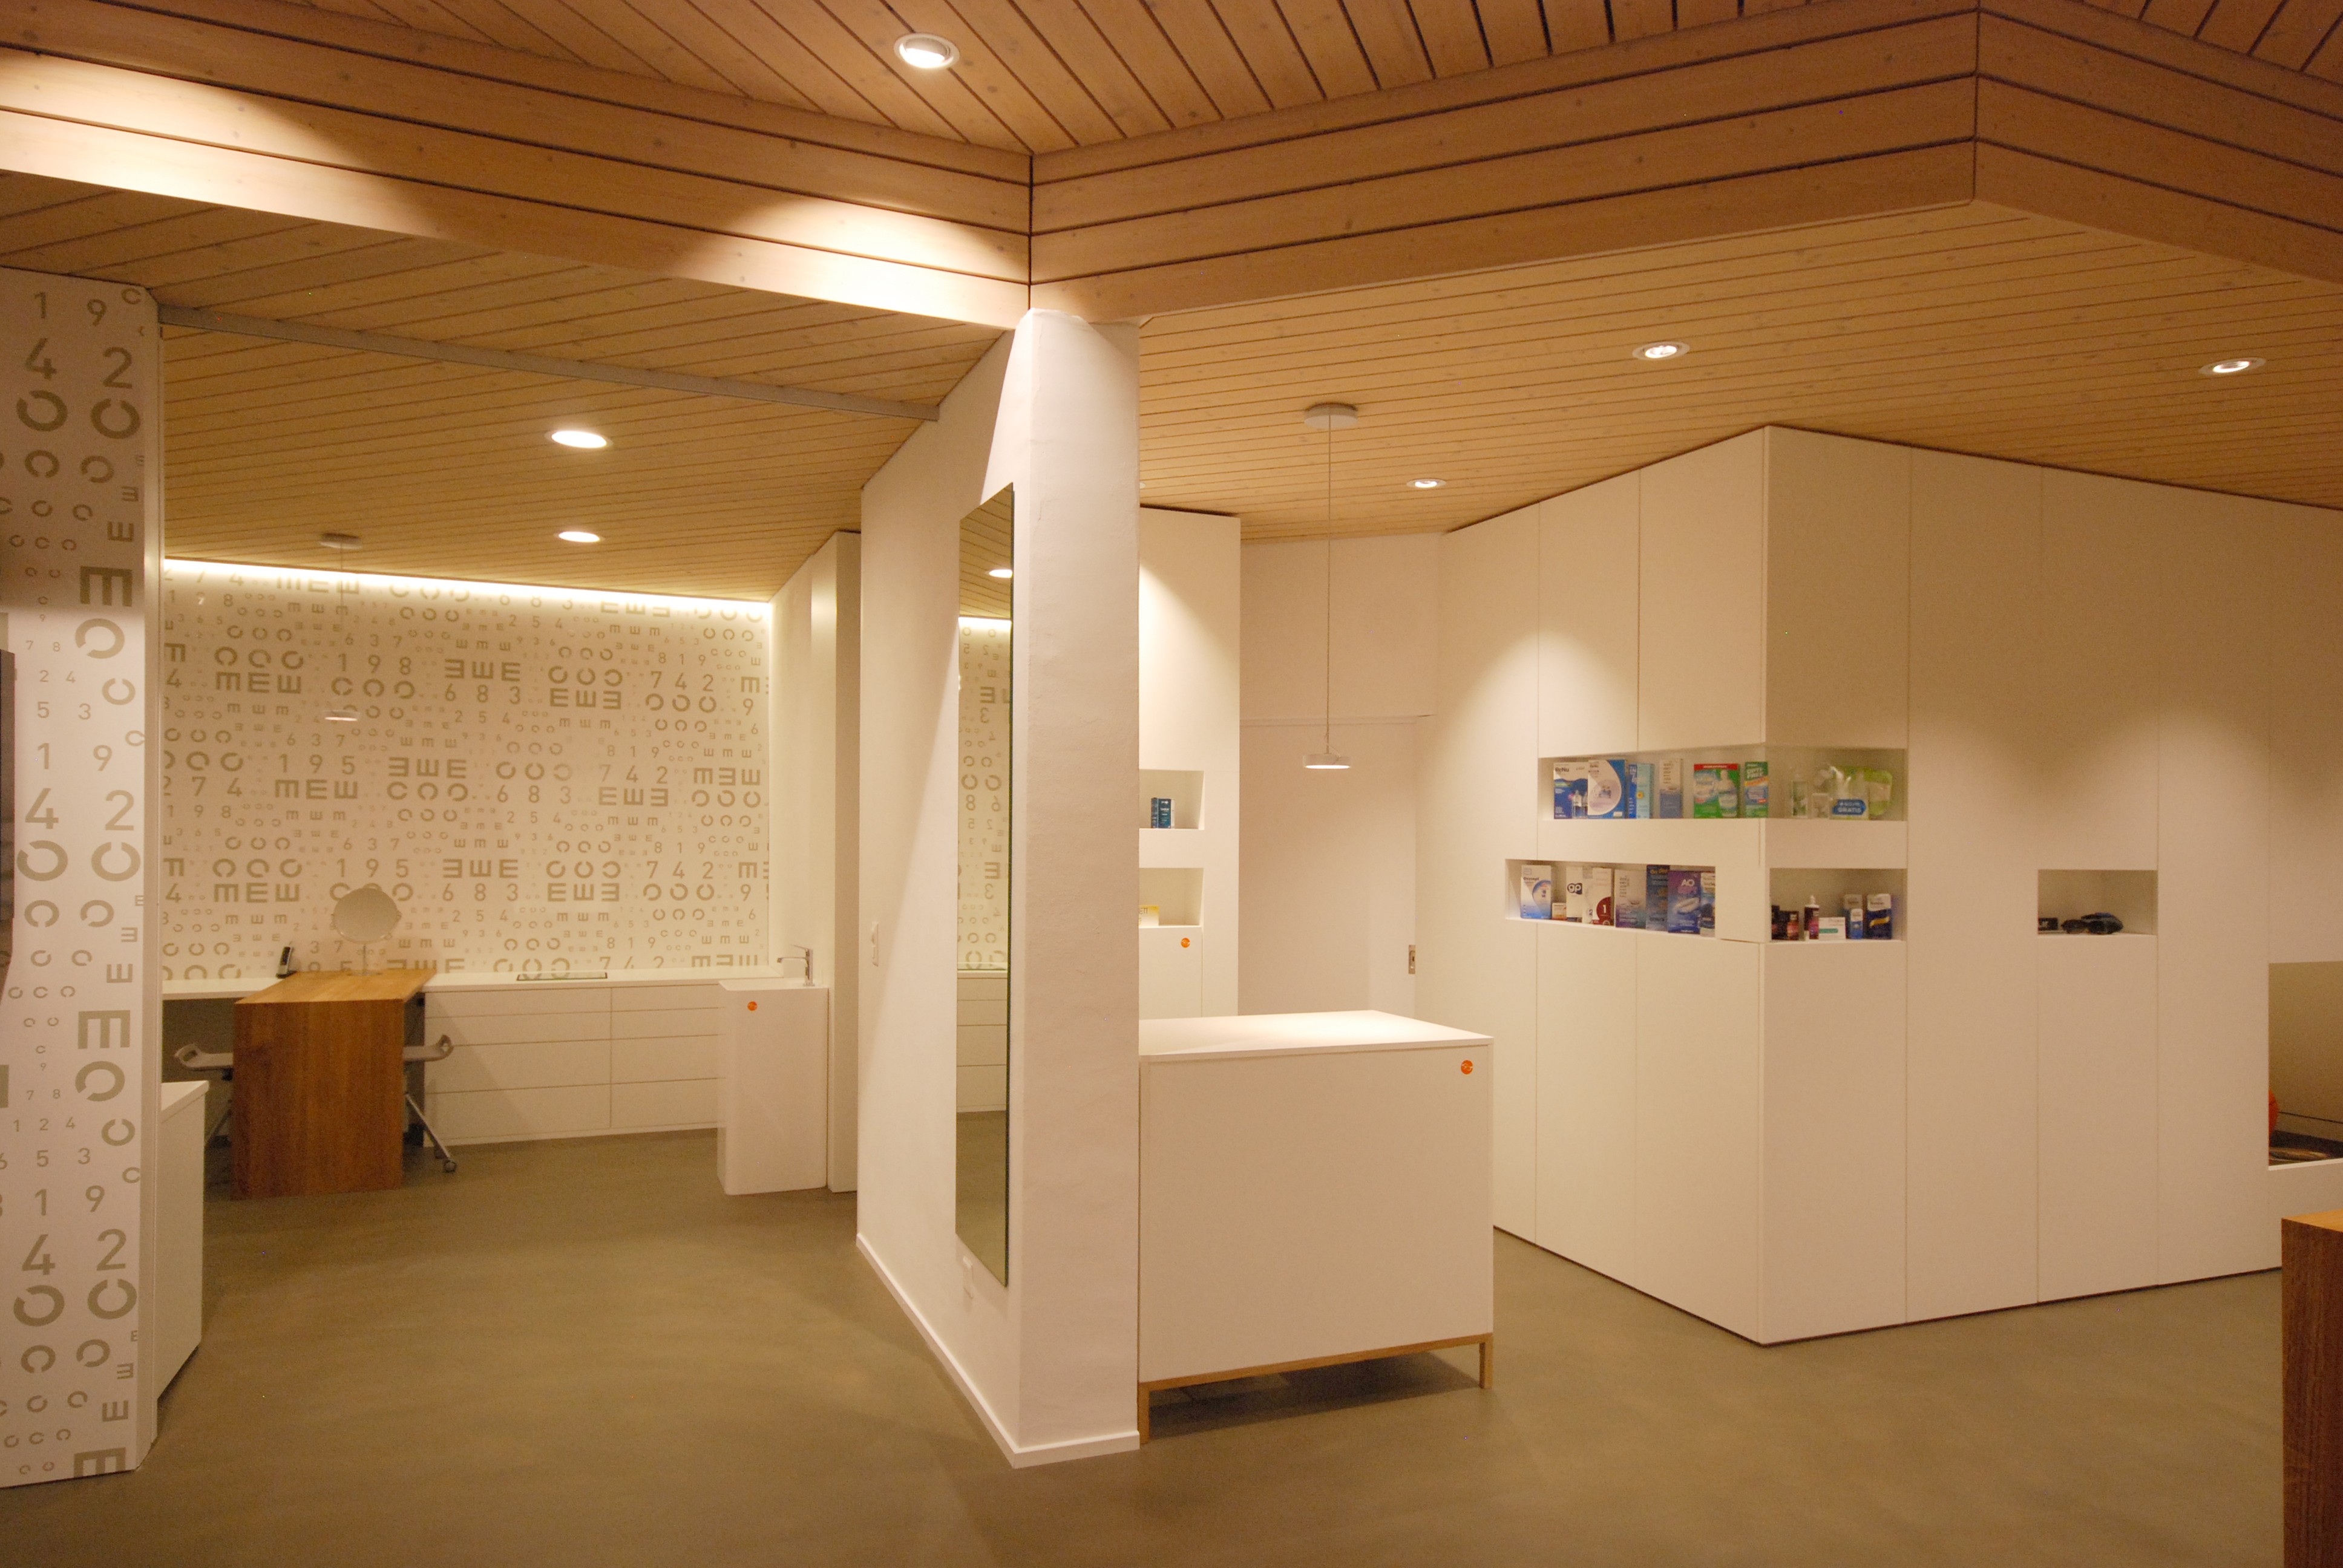 Hoch optik fislisbach innenarchitektur leitgedanke for Design innenarchitektur